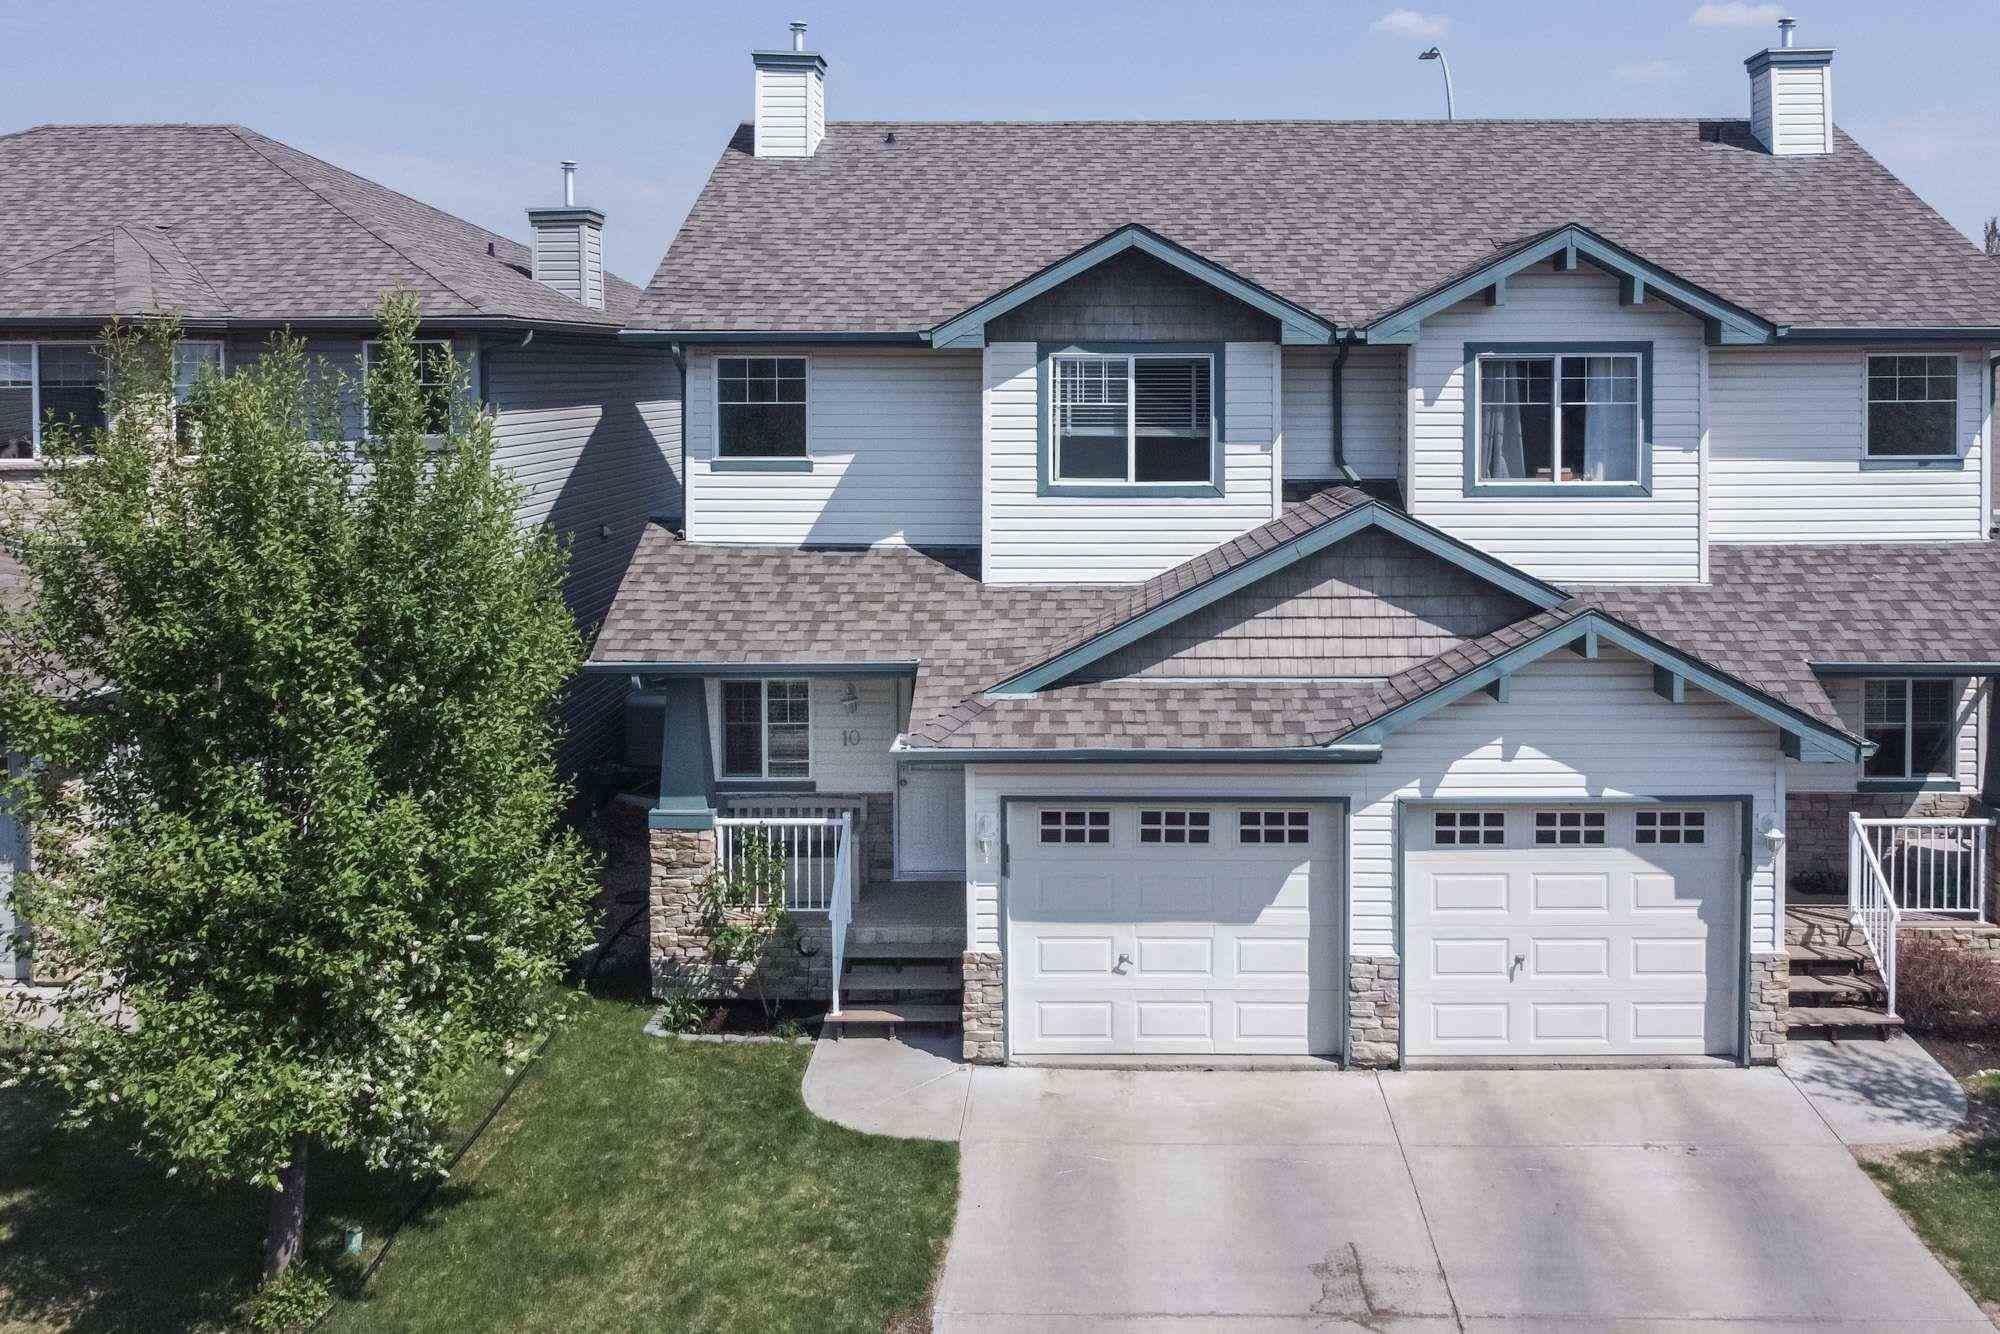 Main Photo: 10 6304 SANDIN Way in Edmonton: Zone 14 House Half Duplex for sale : MLS®# E4245581